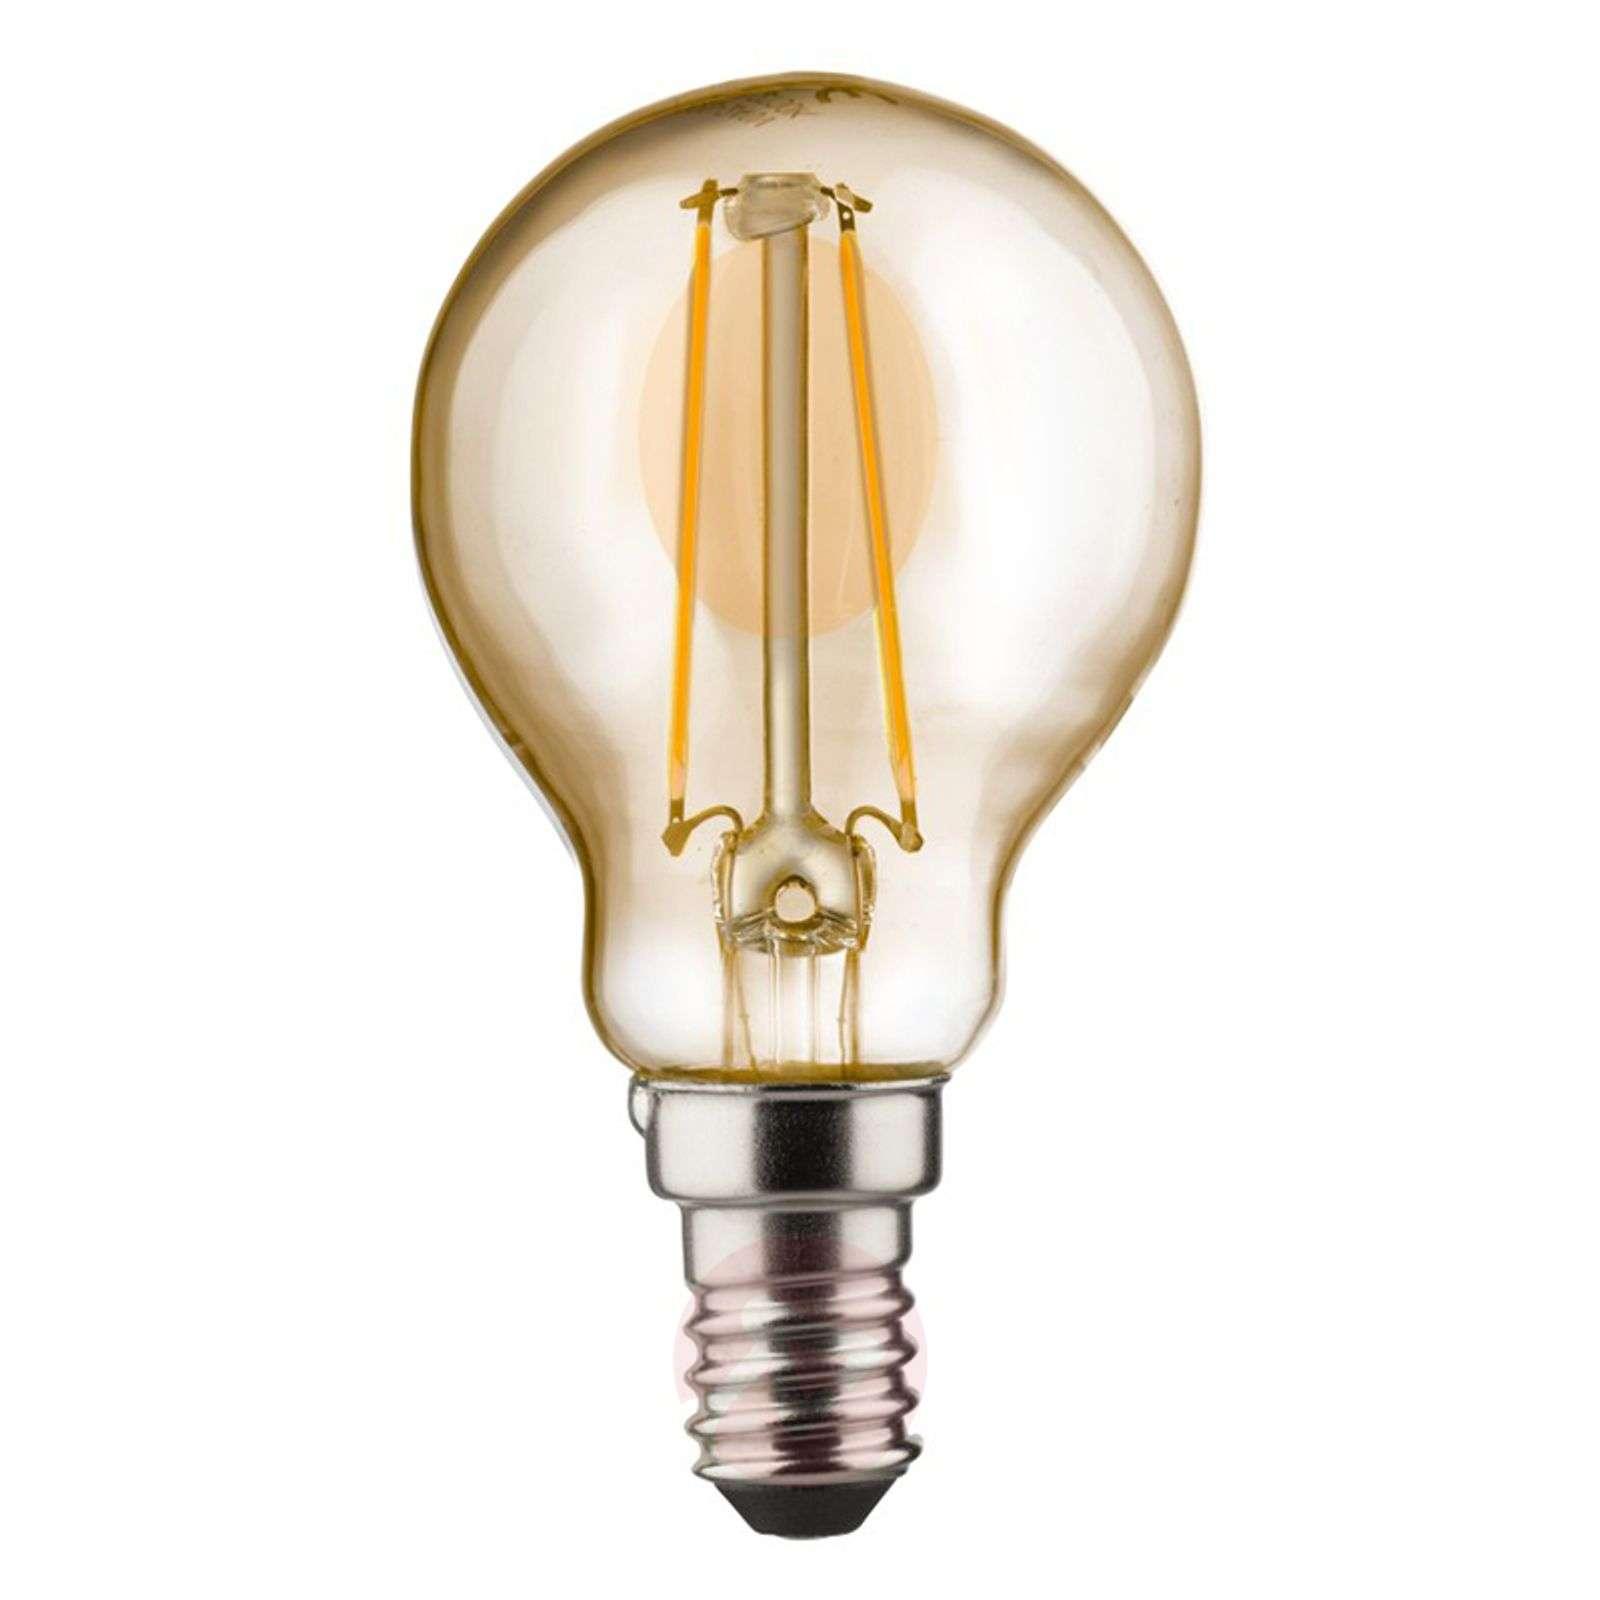 E14 2W 820 LED-pisaralamppu kulta-6520237-01